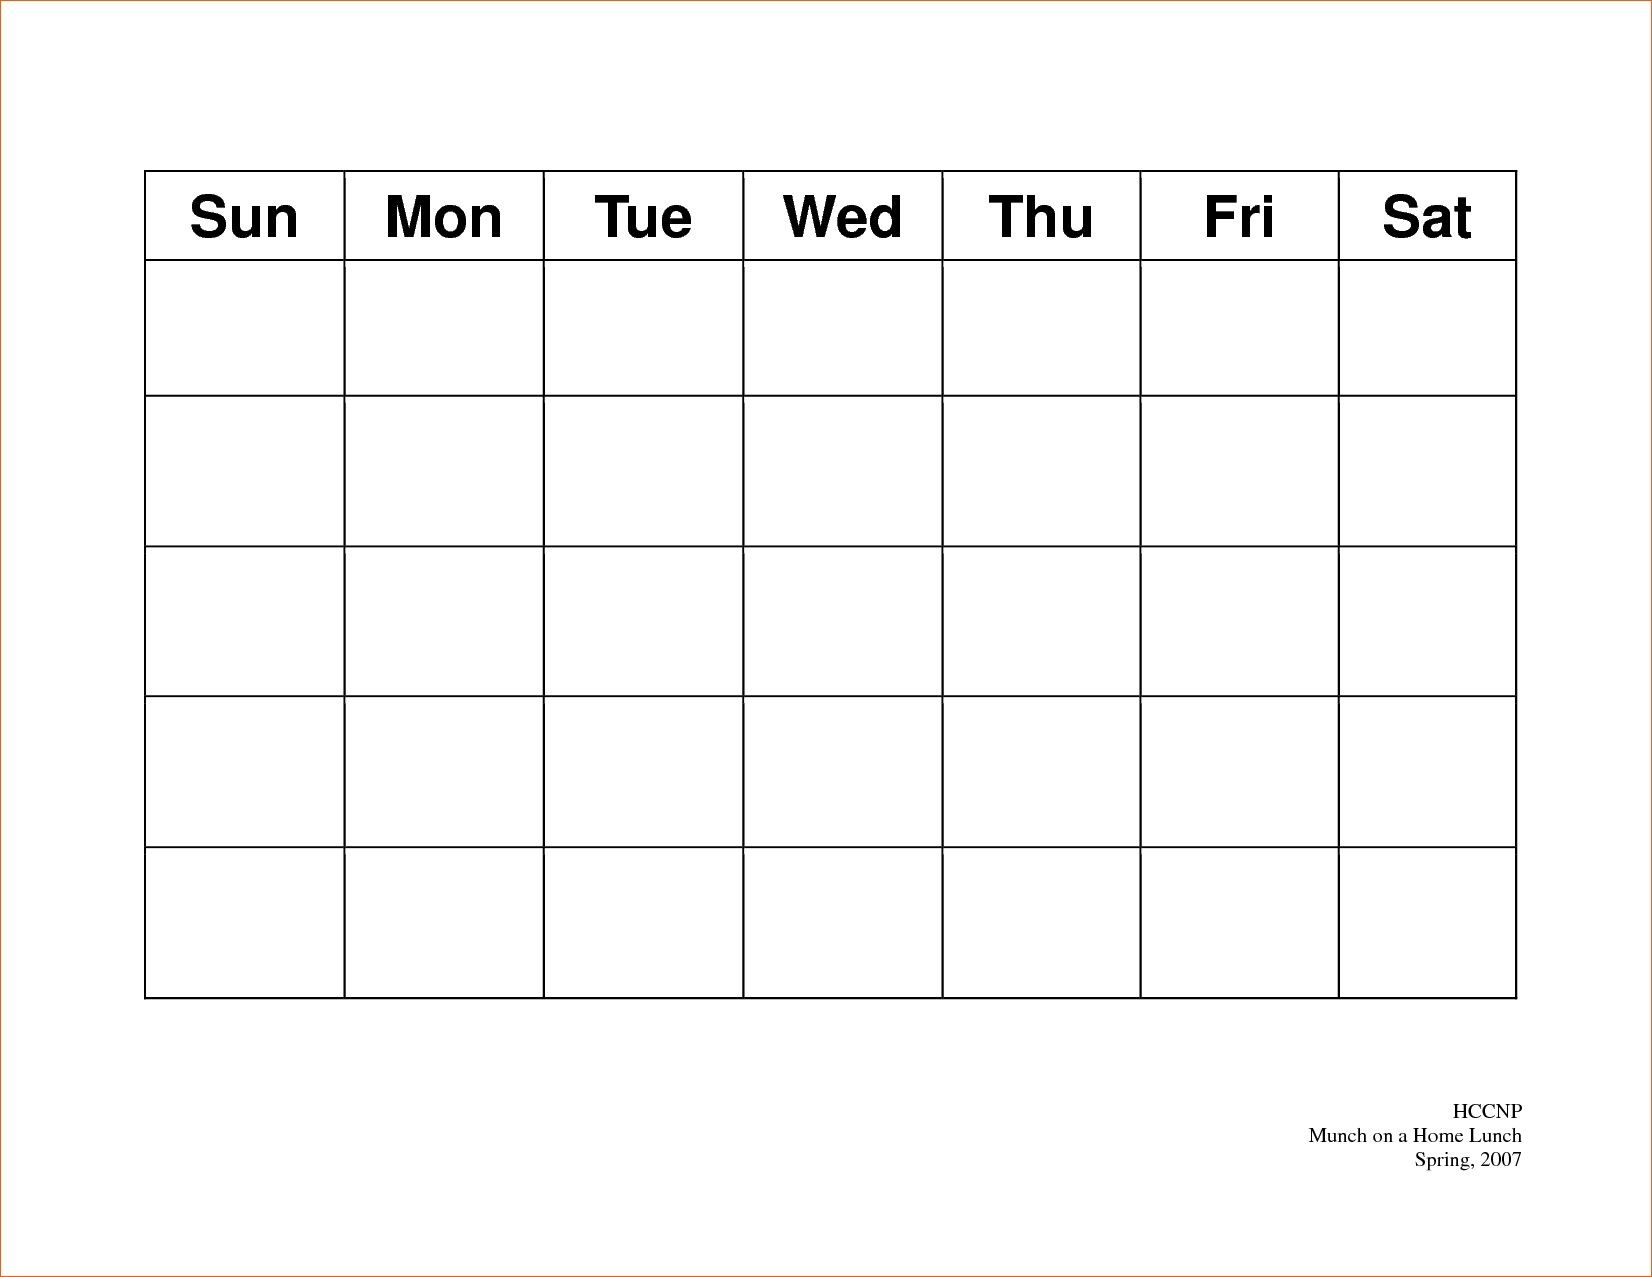 Calendar 5 Day Weekly Calendar Template On 5 Week Calendar regarding 5 Day Weekly Planner Template